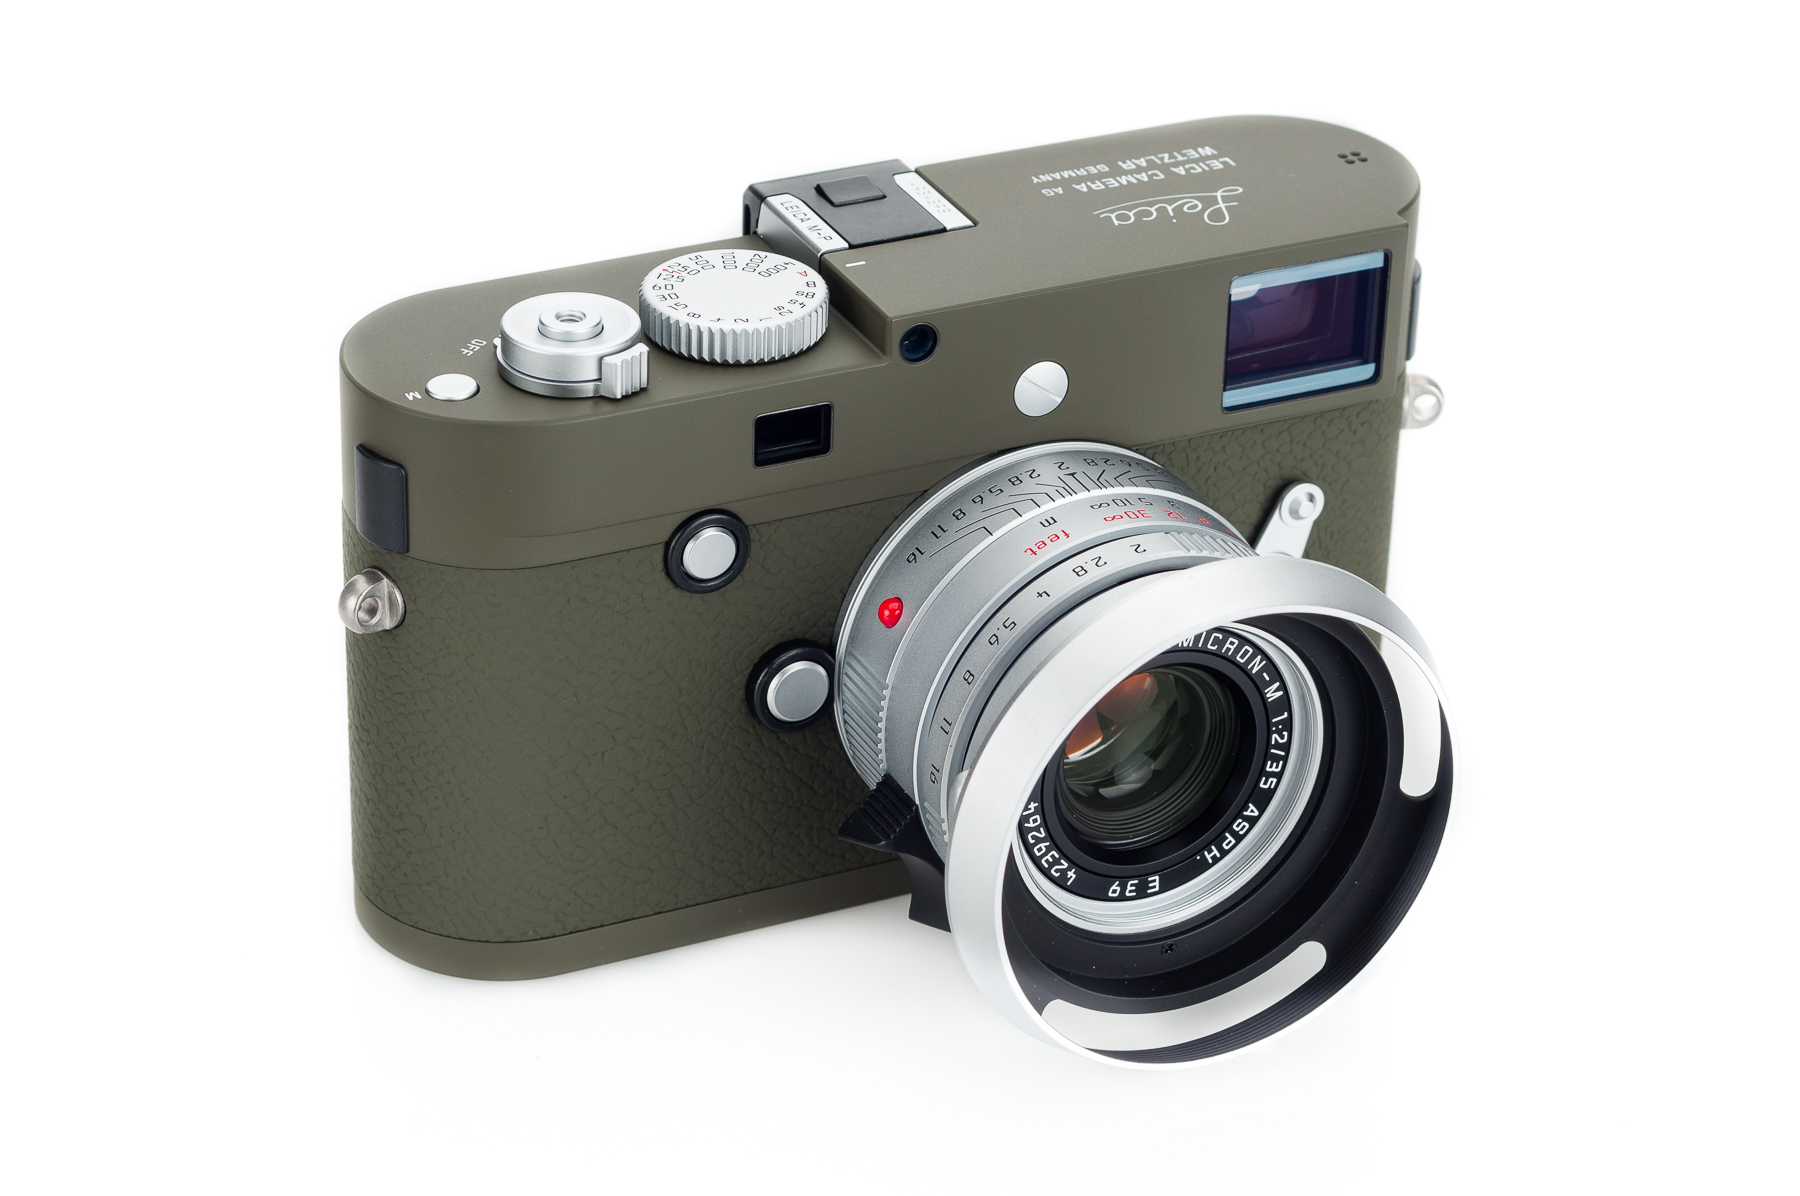 лейка фотоаппарат описание